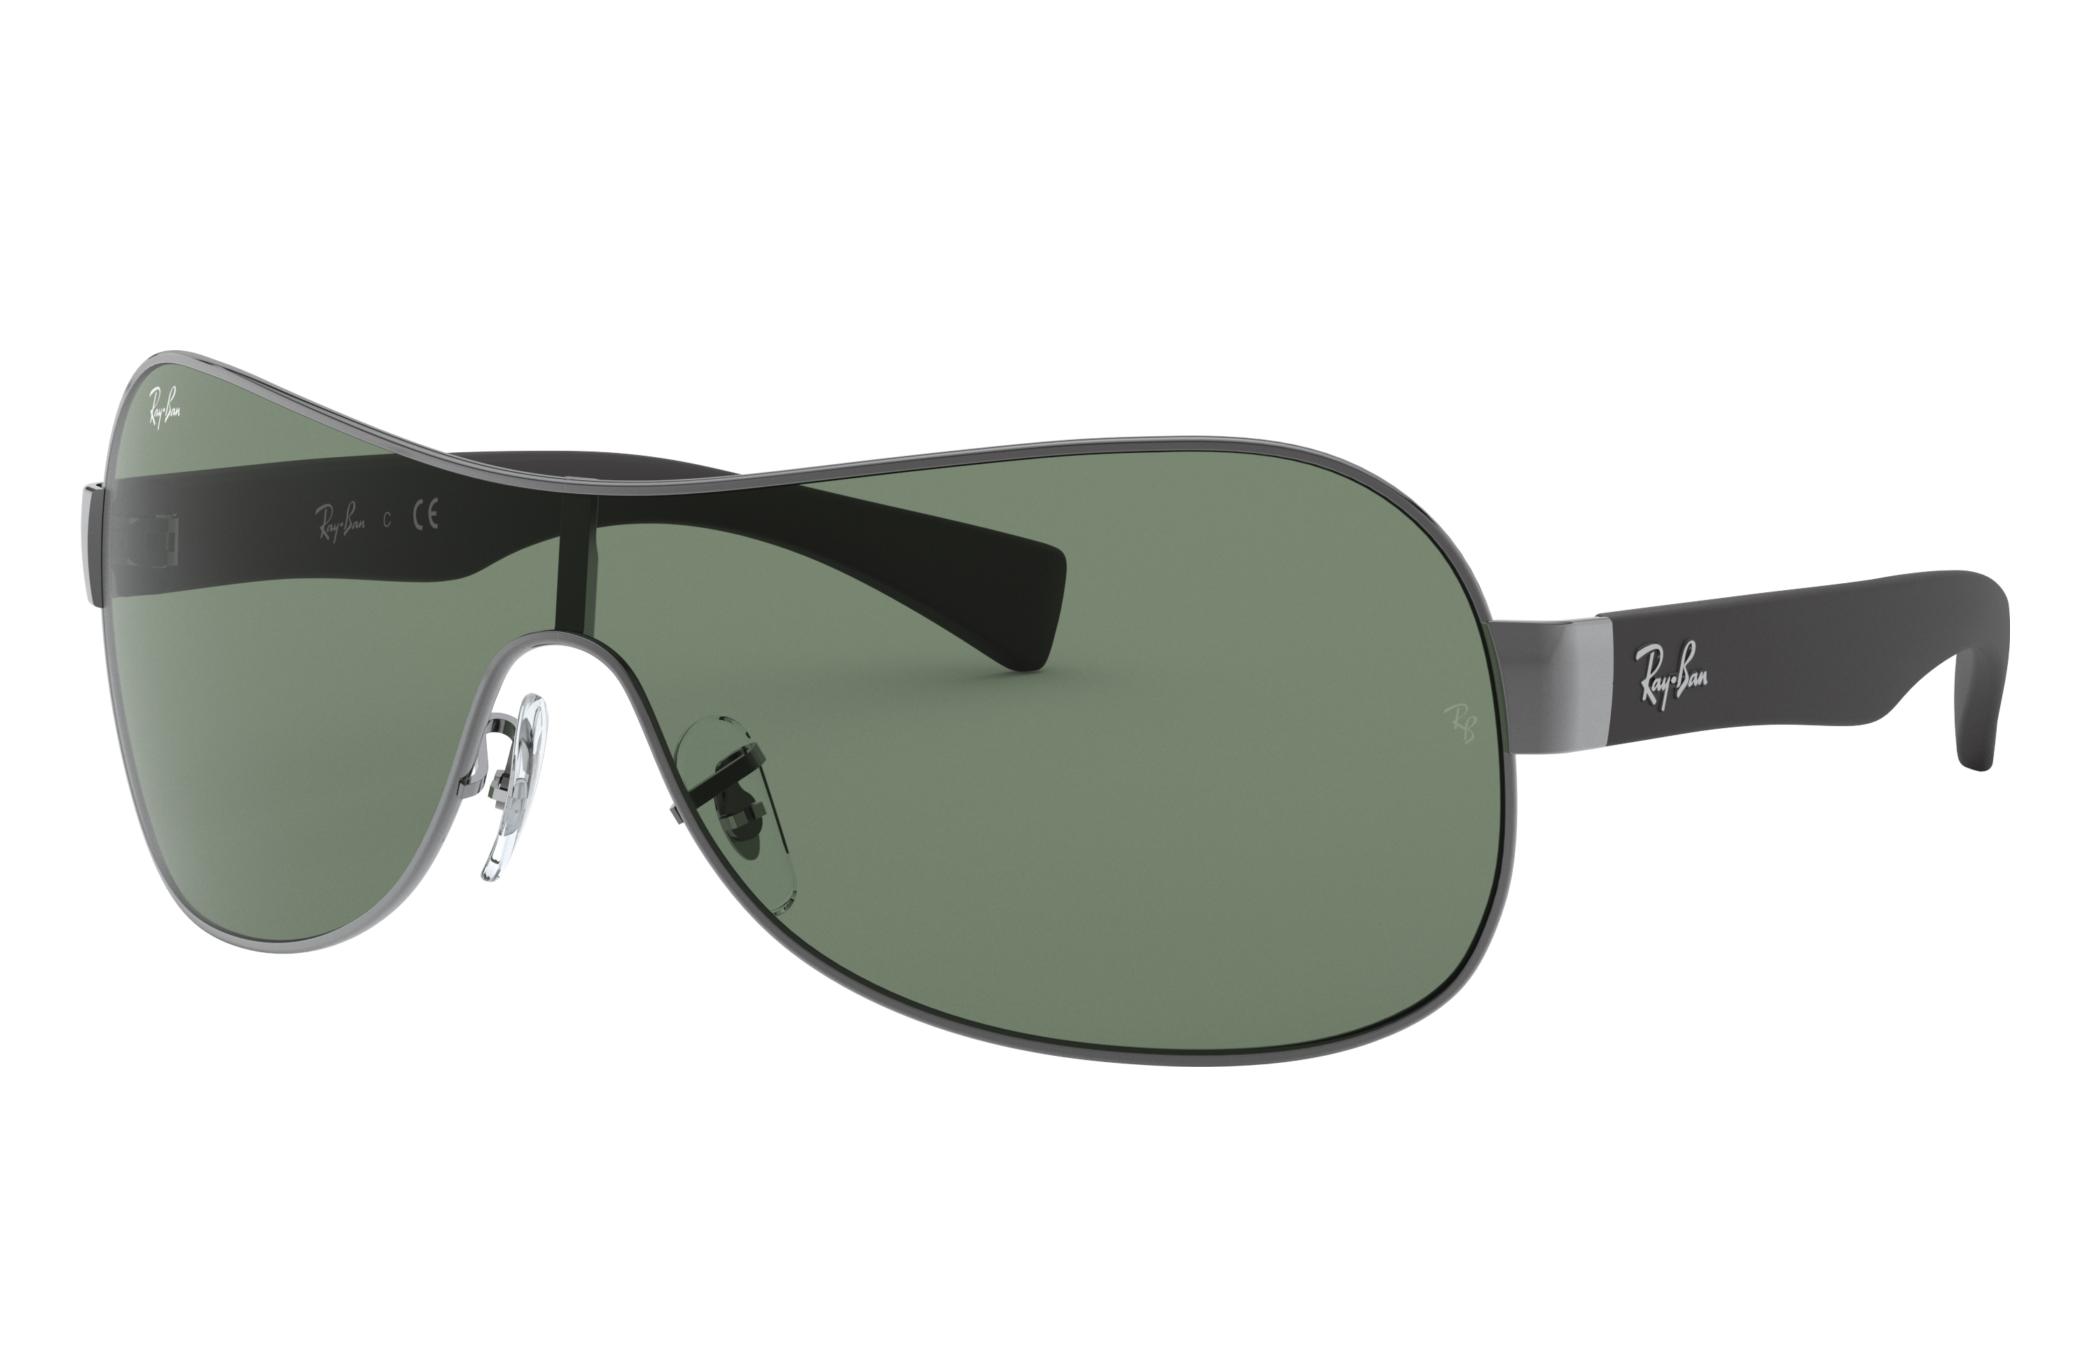 Ray-Ban Rb3471 Black, Green Lenses - RB3471